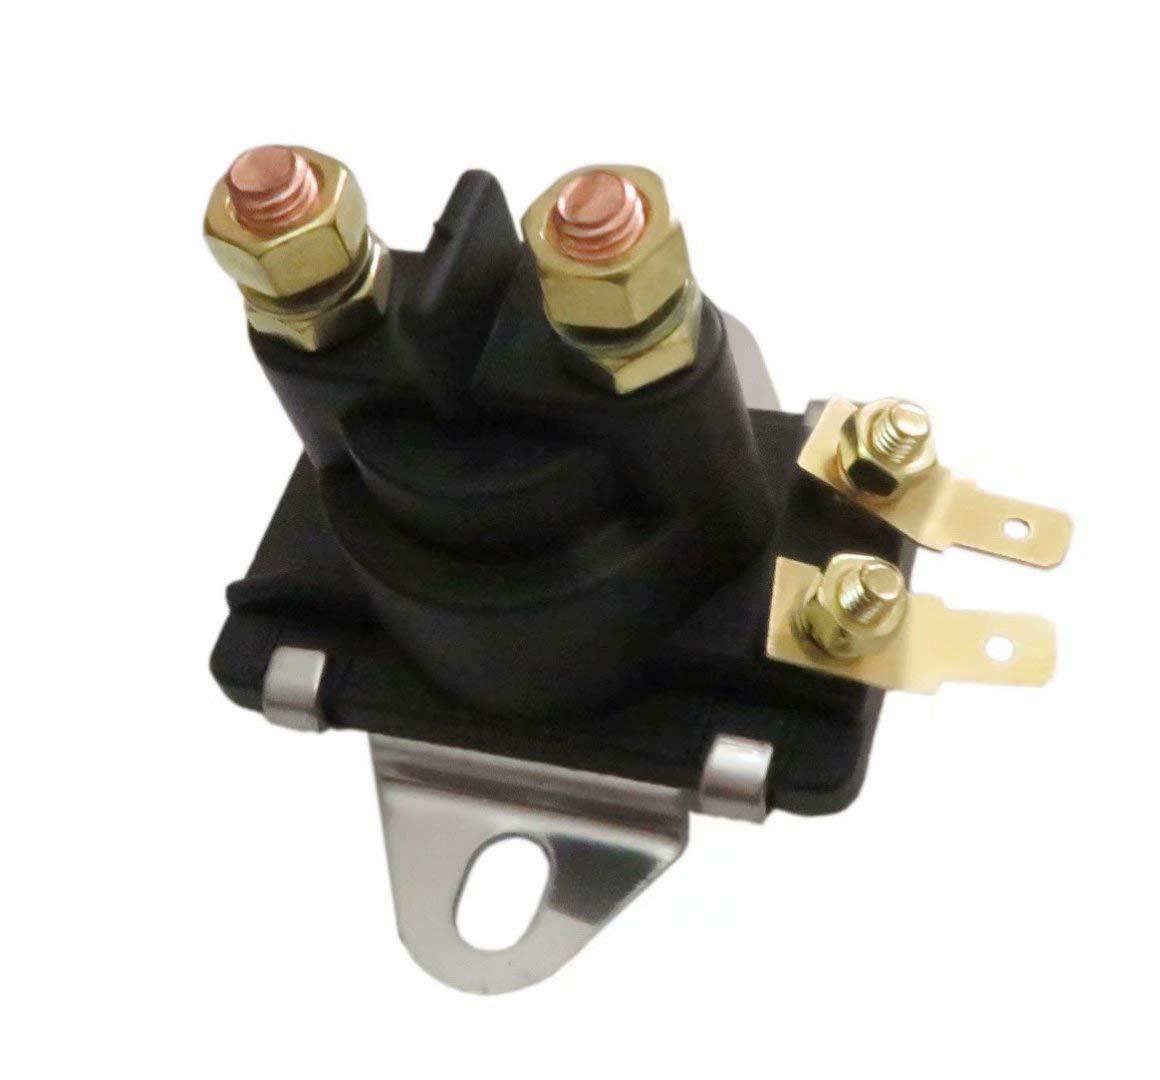 Trim Solenoid Relay Switch for Mercury Mercruiser Marine 12 Volt 4 Terminal 89846070 8994318 8996158 8996158T